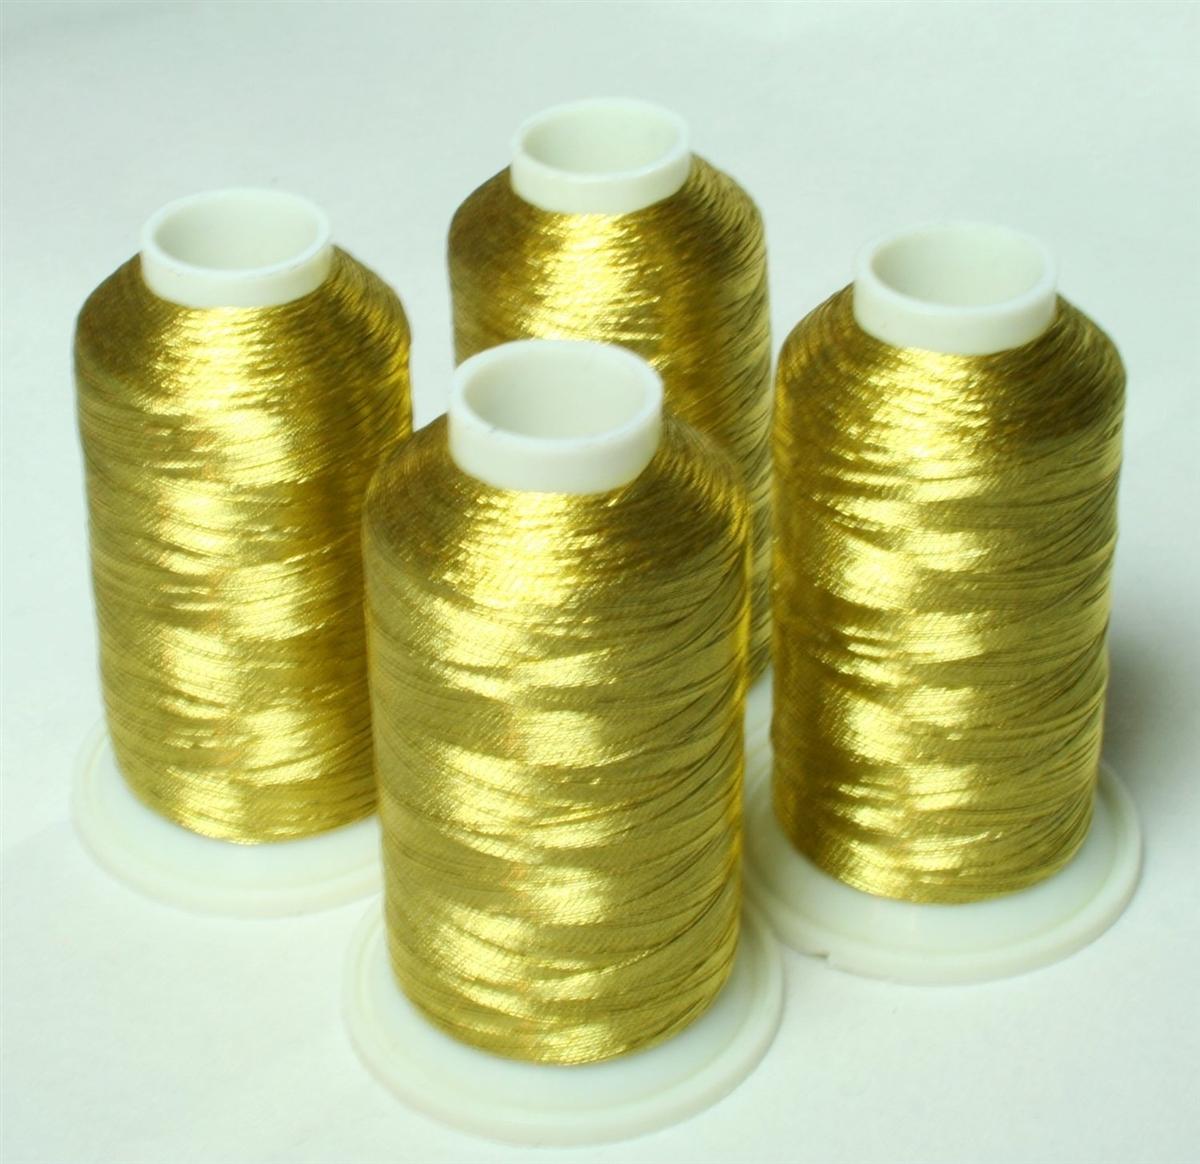 4 Cones Of Antique Gold Metallic Machine Embroidery Thread